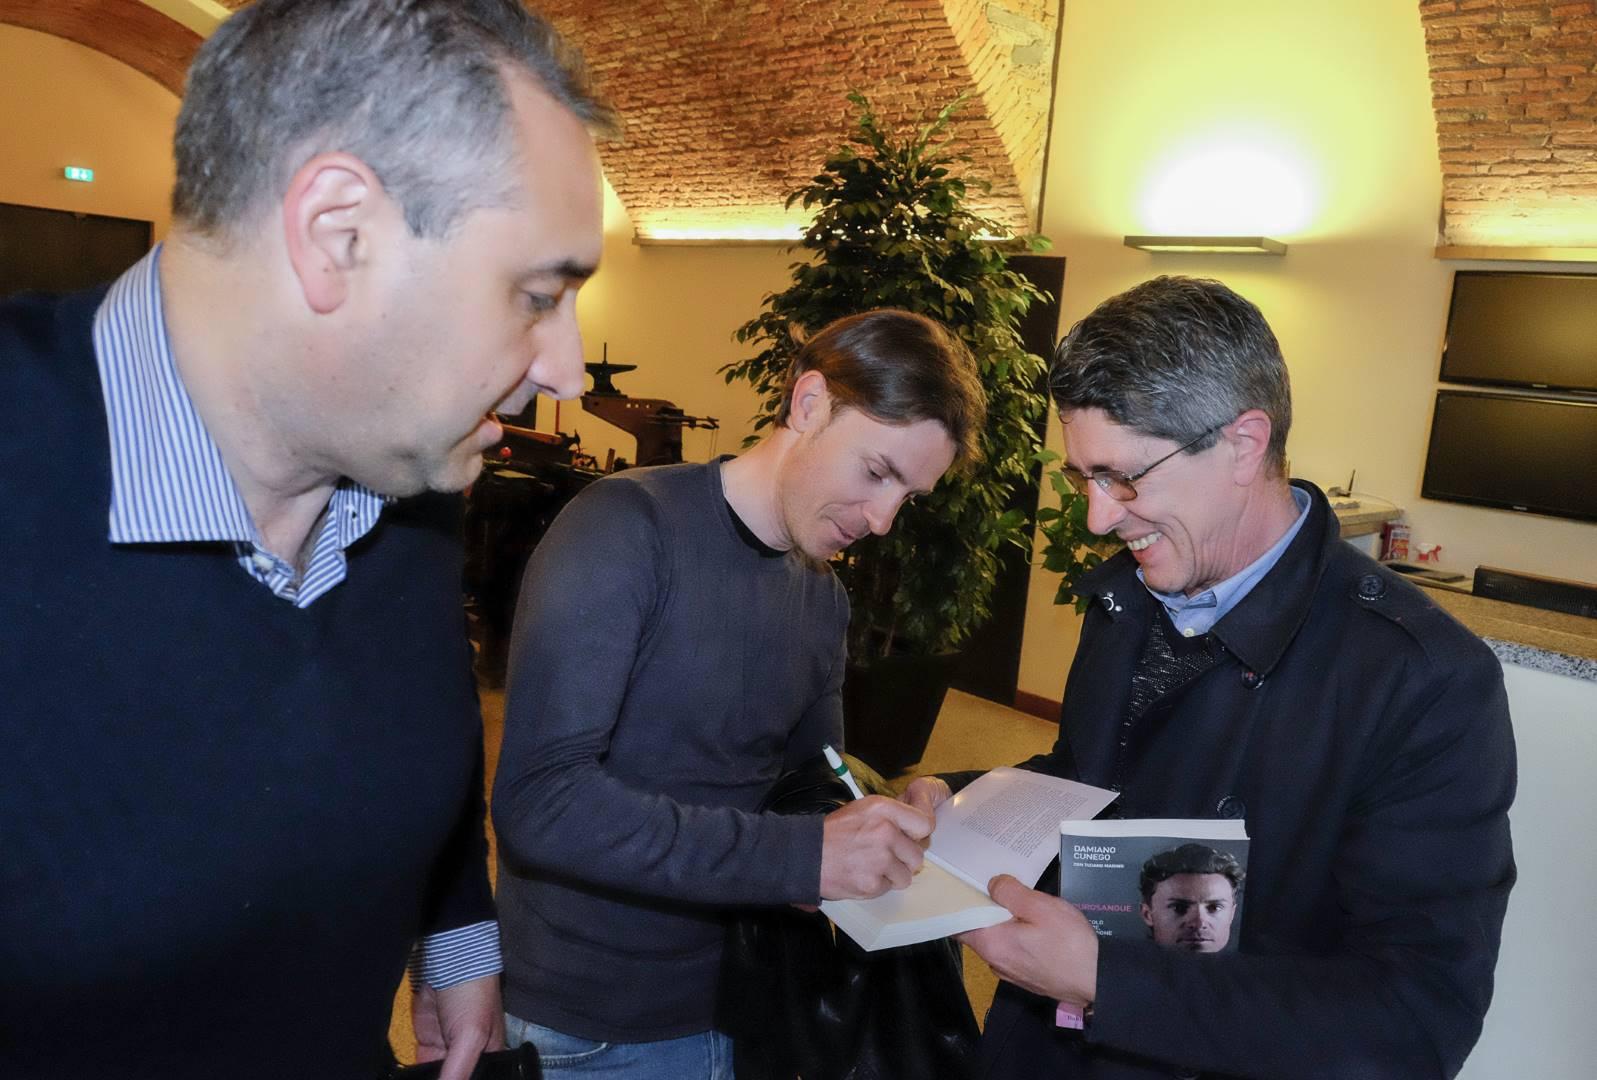 Damiano Cunego autografi